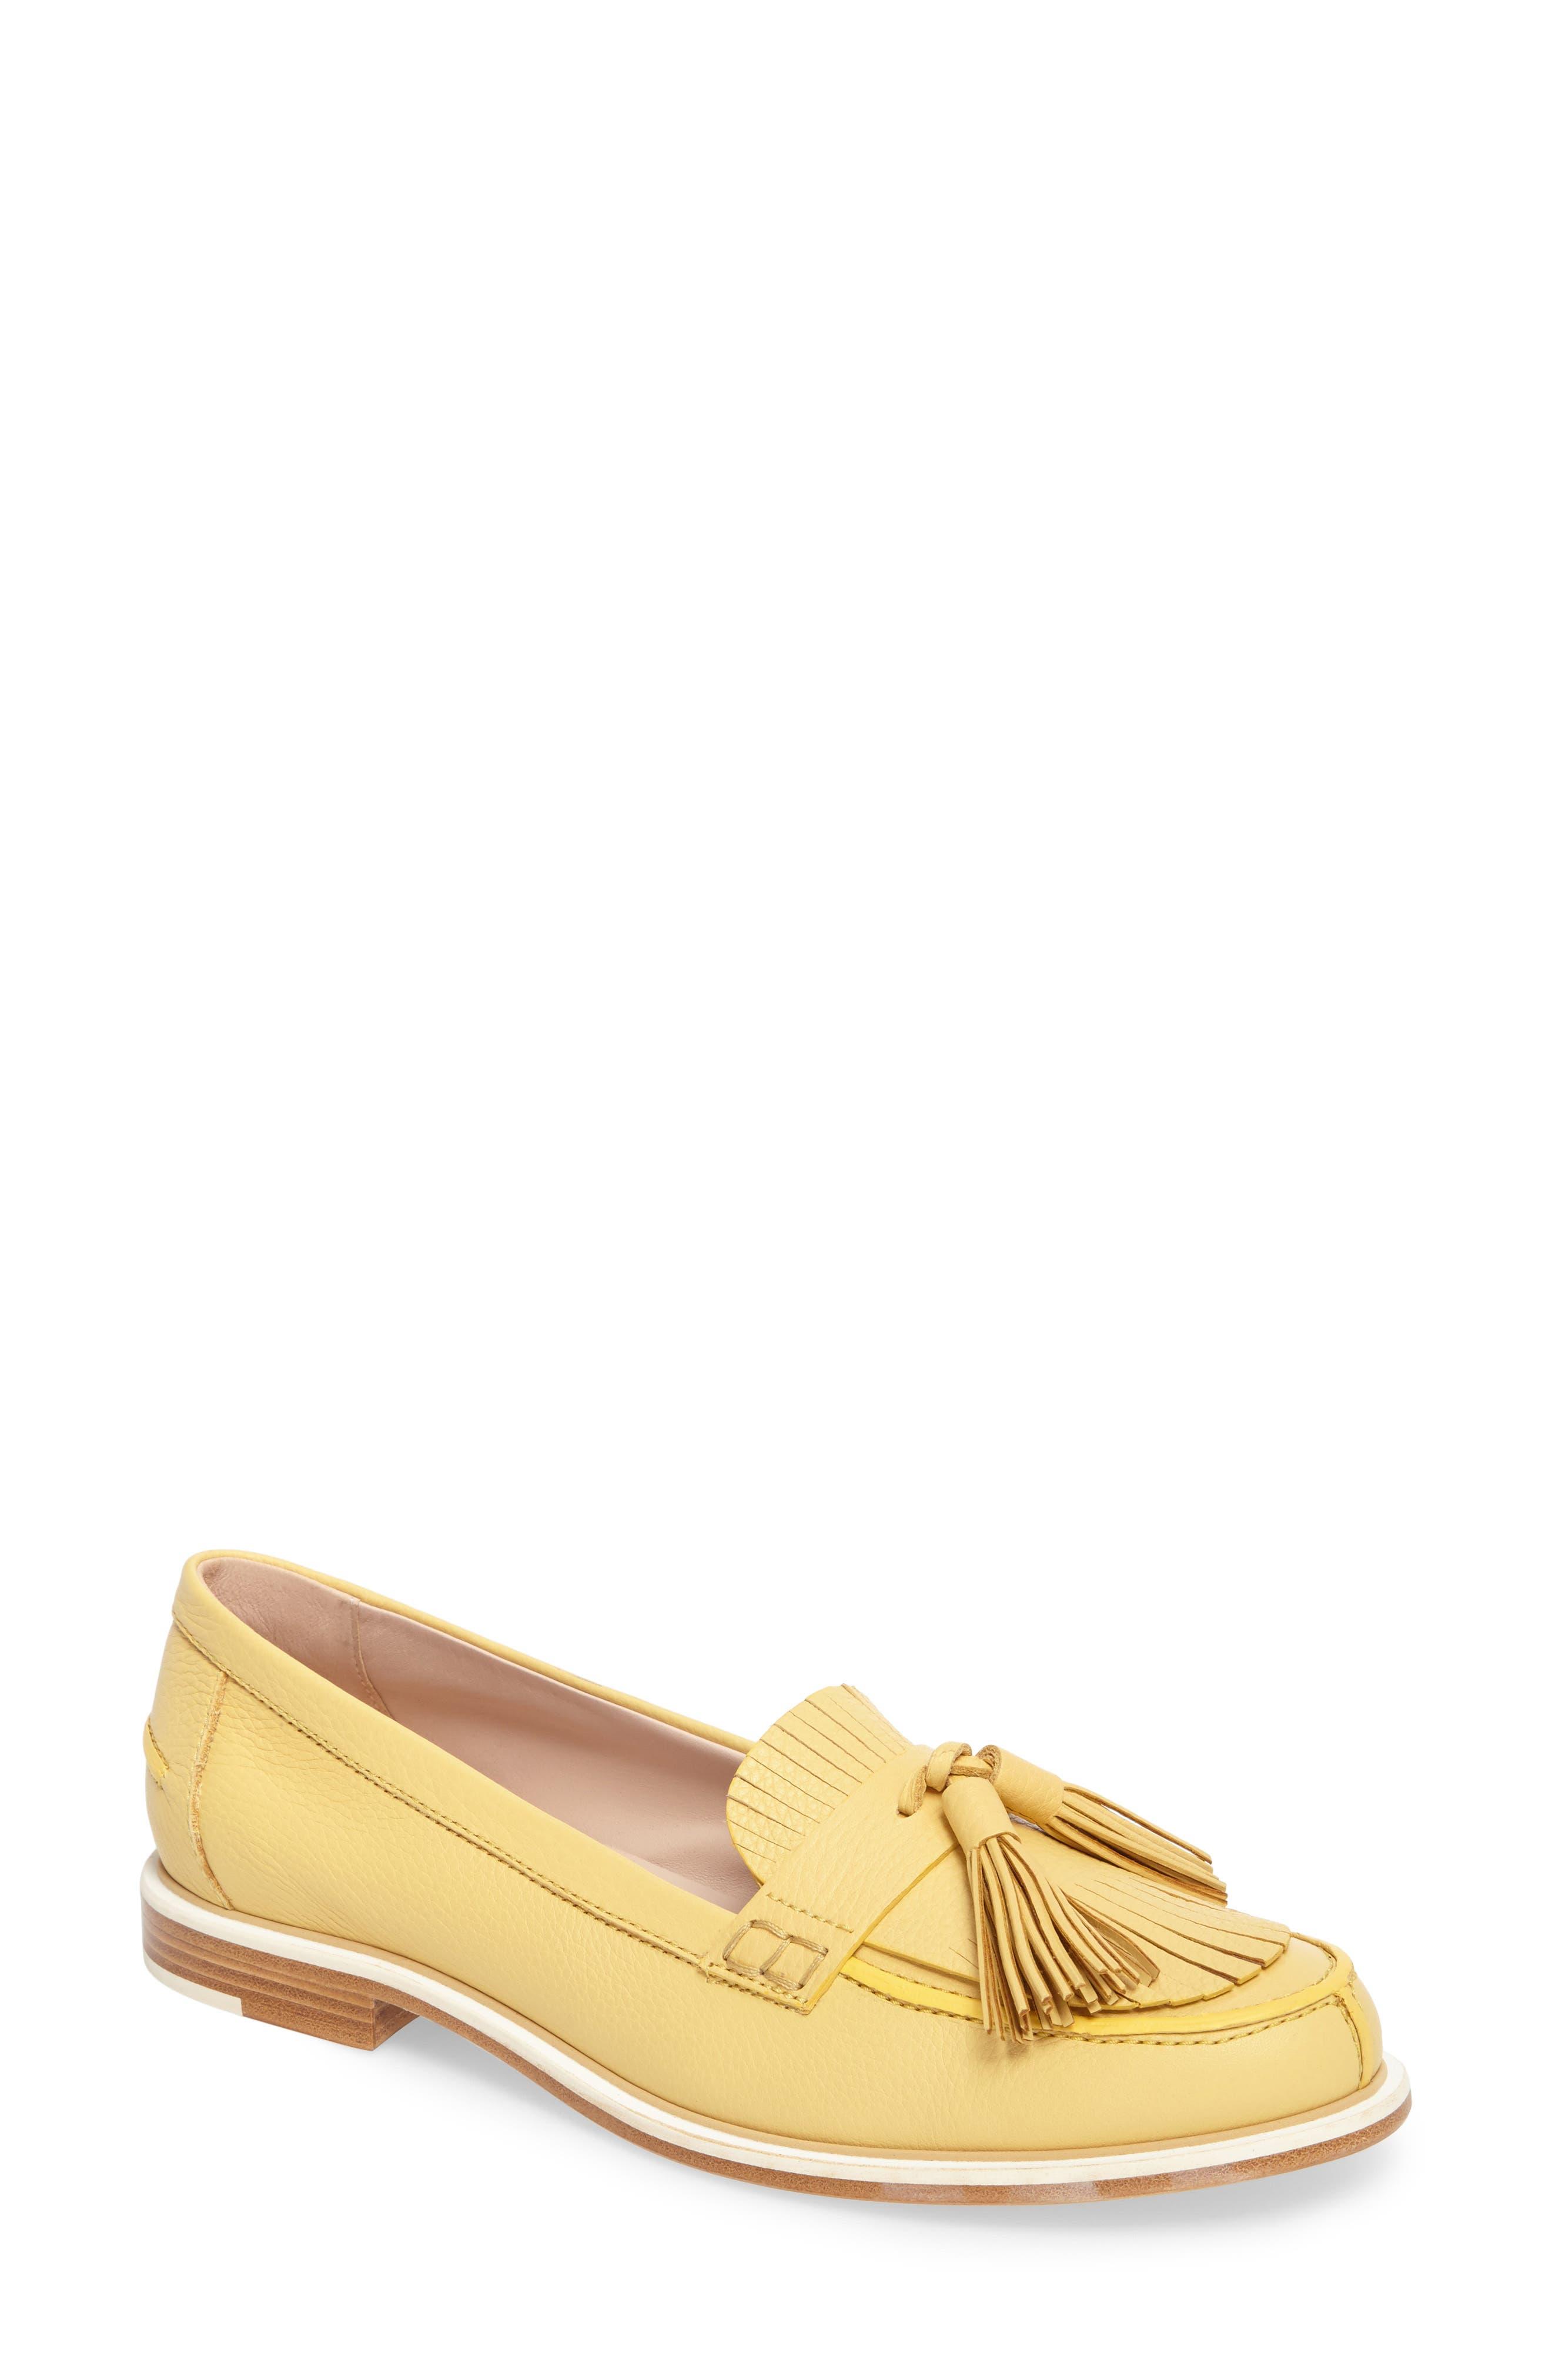 Fringe Tassel Loafer,                         Main,                         color, Pale Yellow